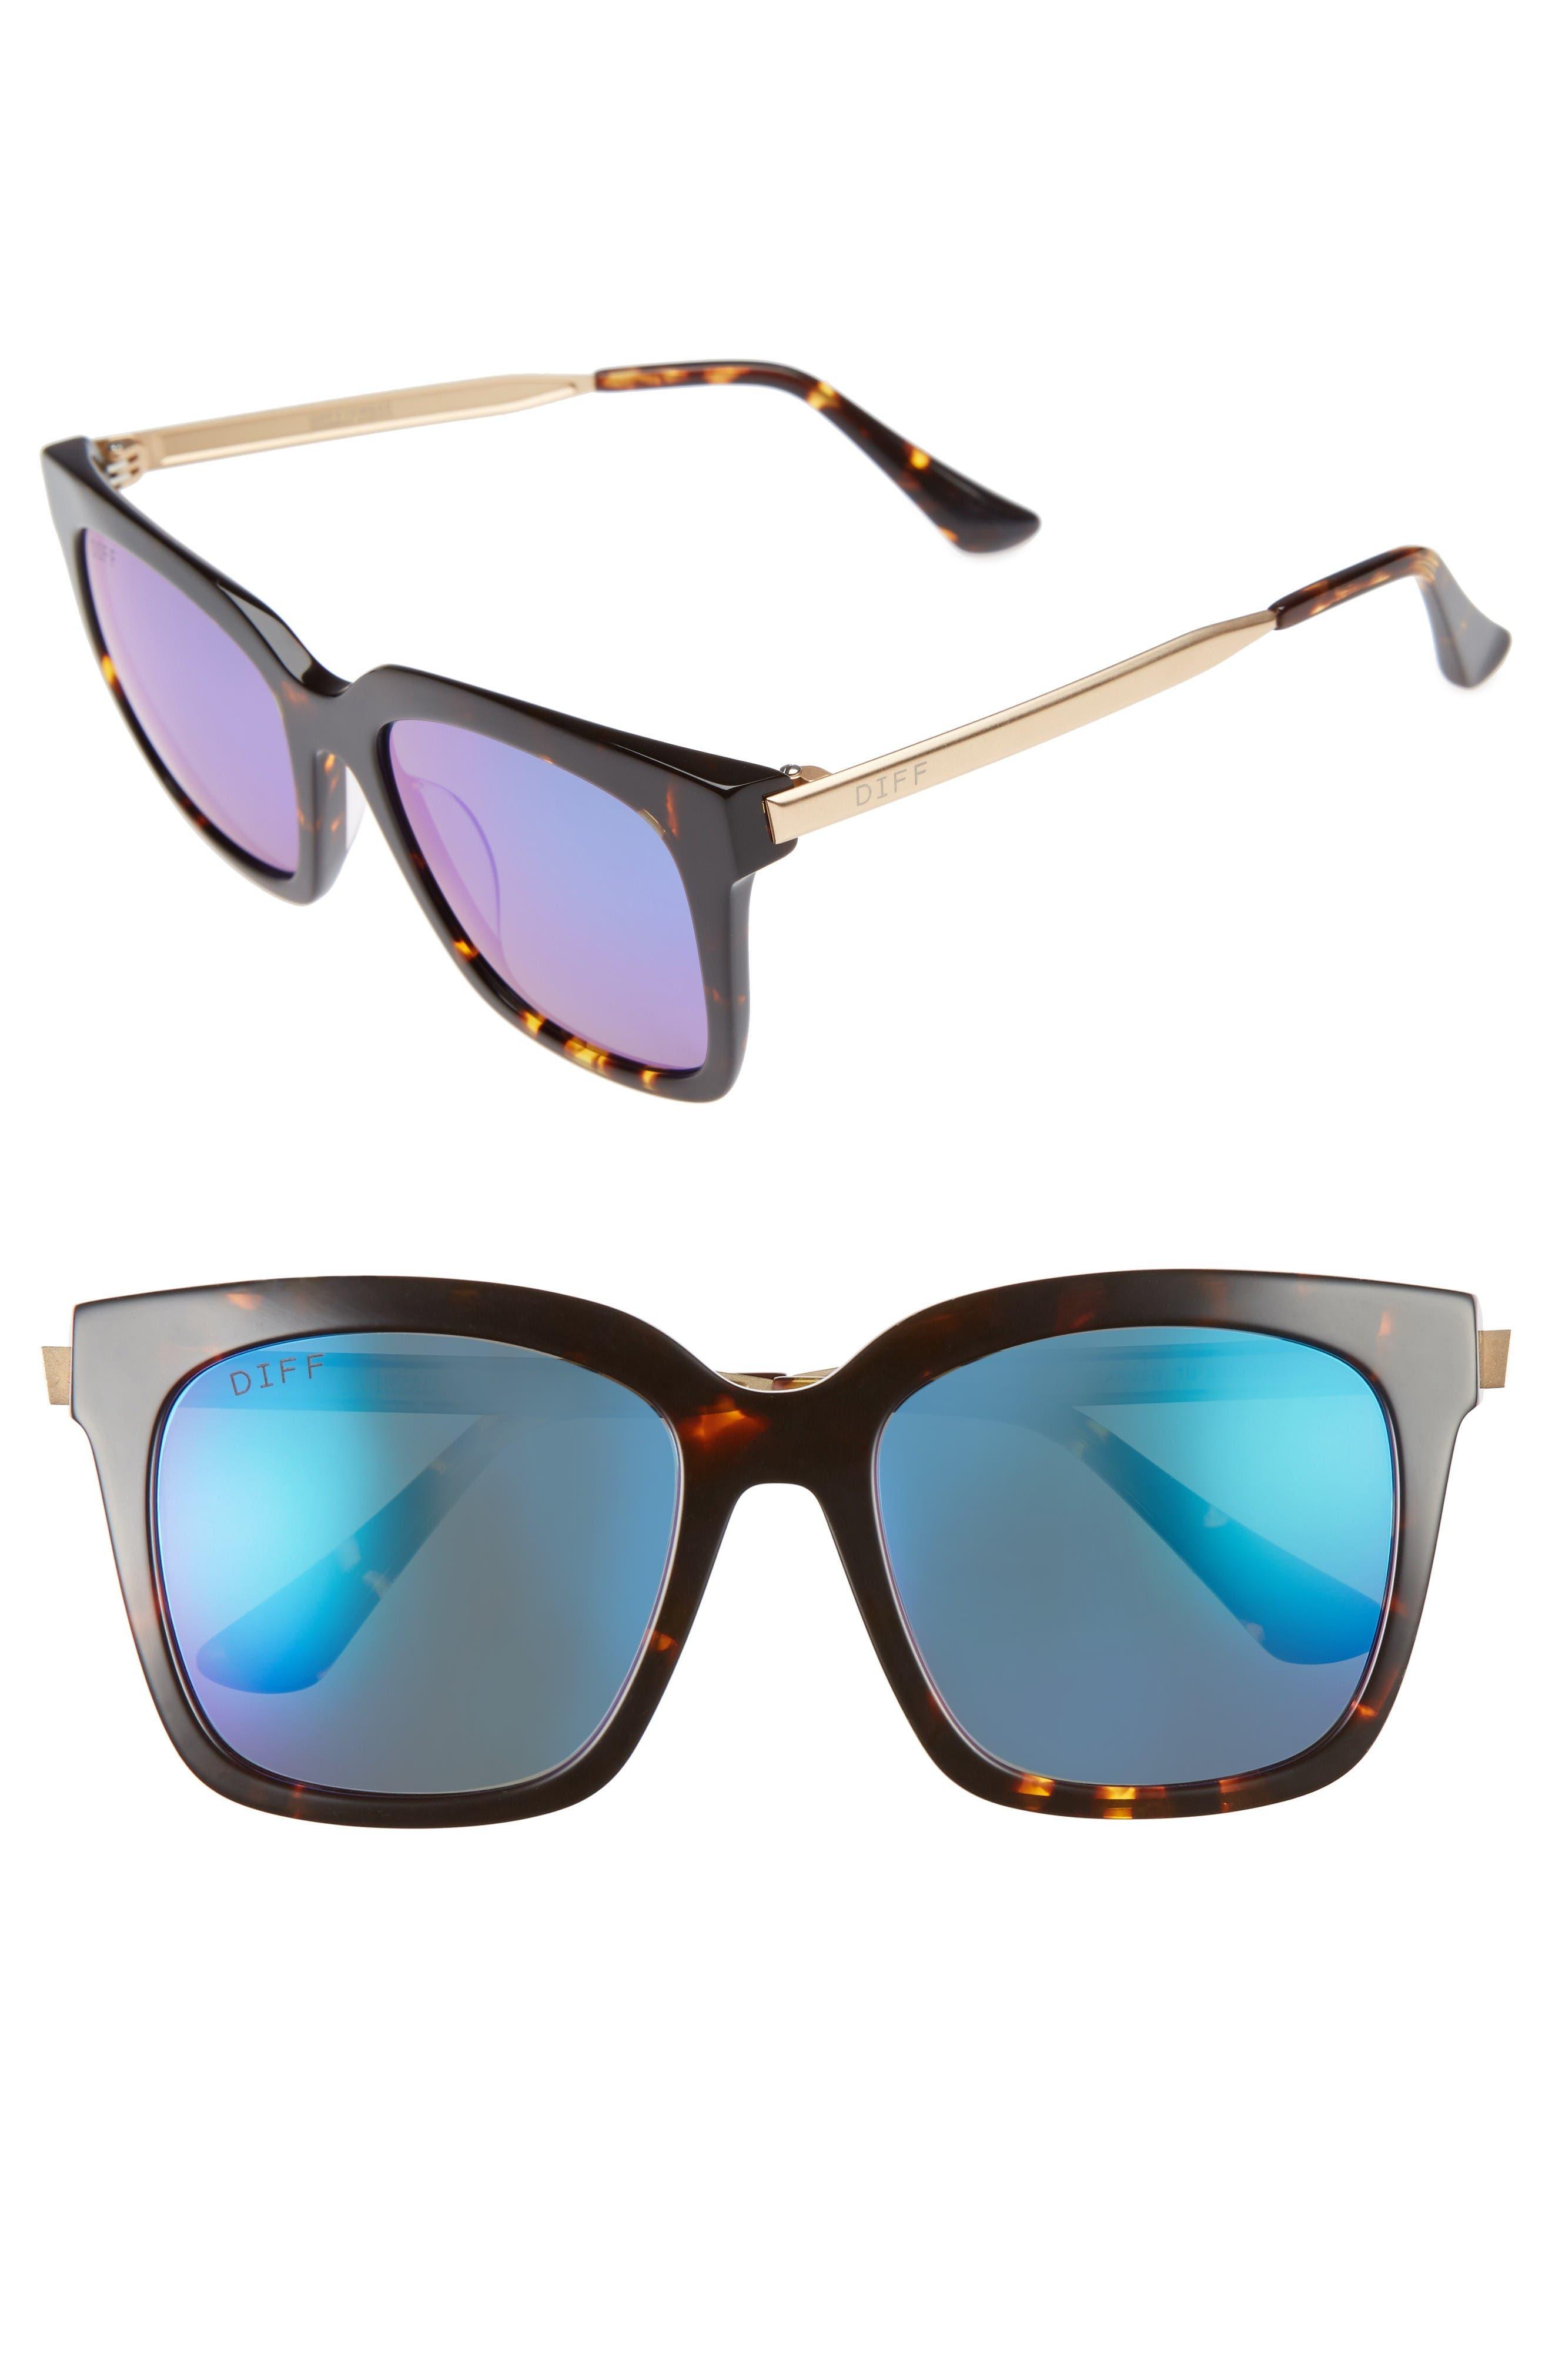 Bella 52mm Polarized Sunglasses,                         Main,                         color, Tortoise/ Blue